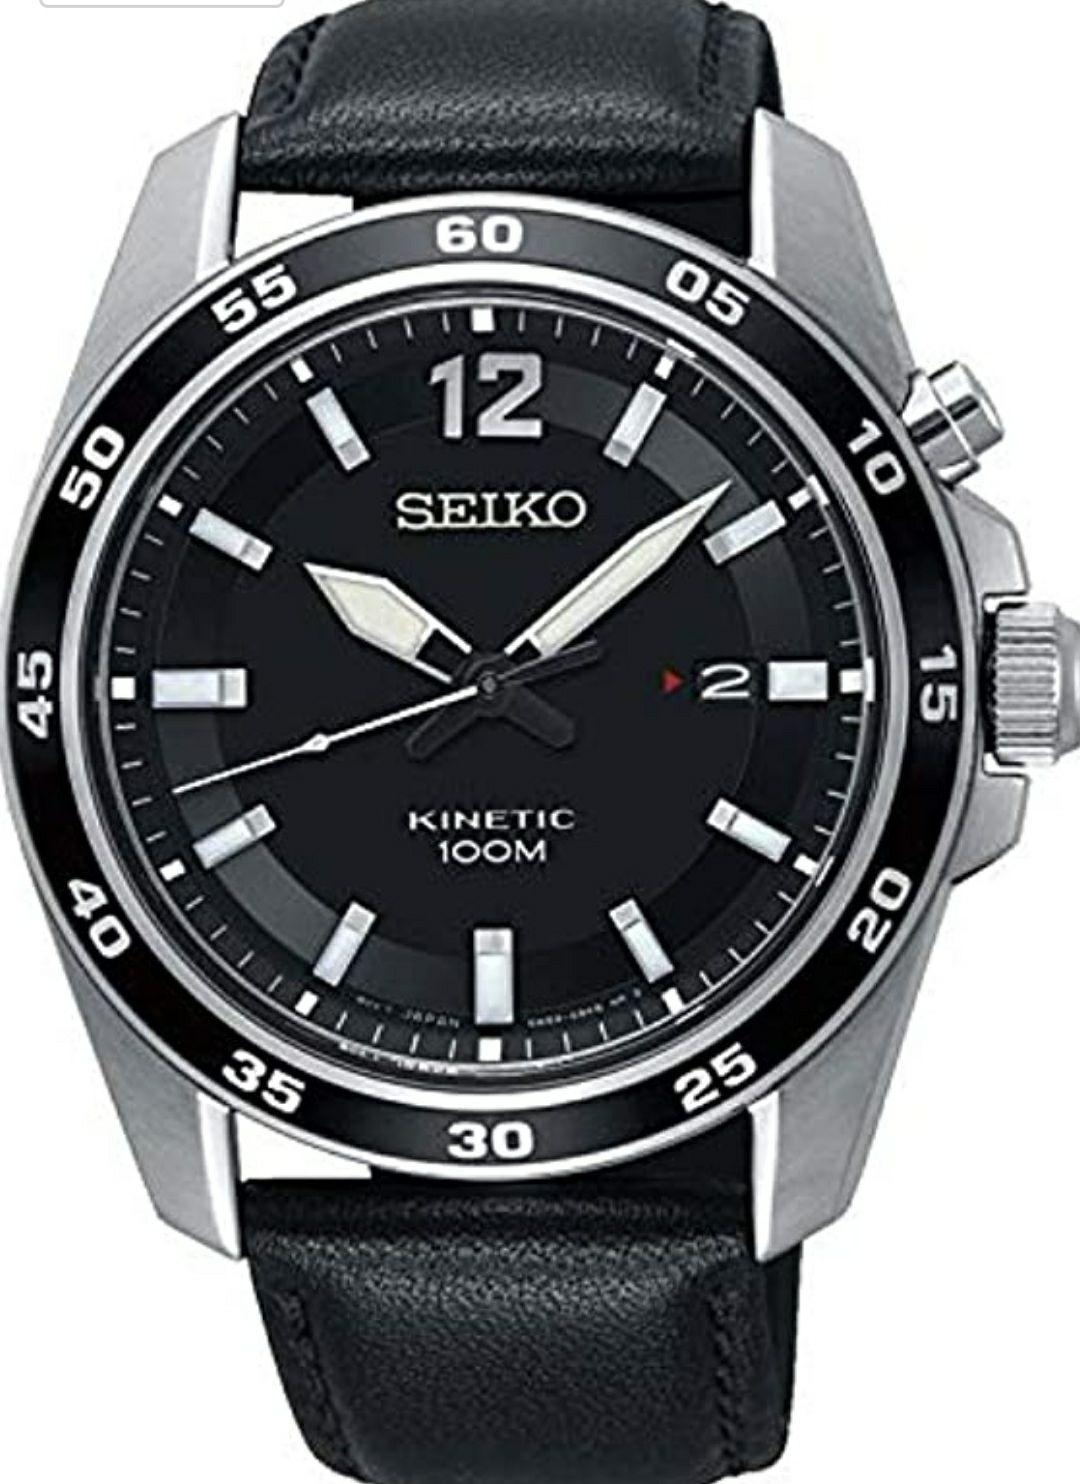 Seiko Kinetic SKA789P1 (Envio incluido)